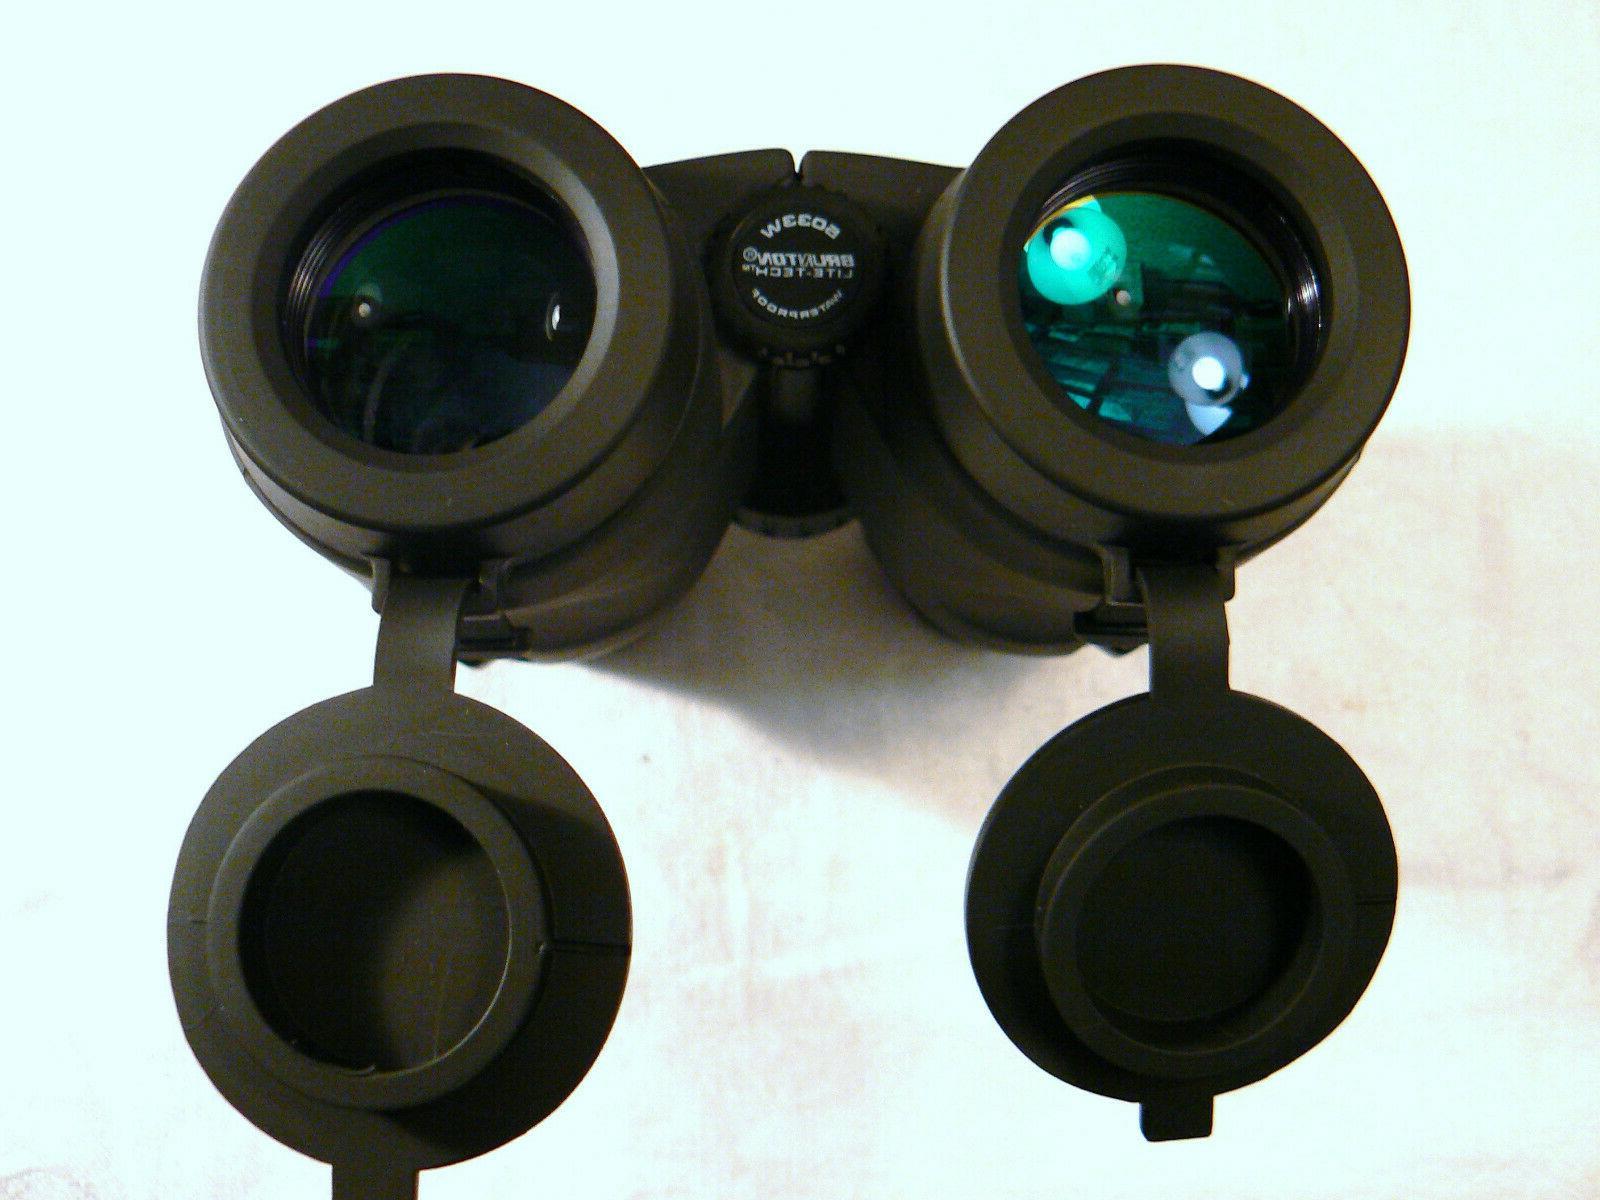 NEW NOS 5033W Lite-Tech Binoculars 8x32 FOV Black